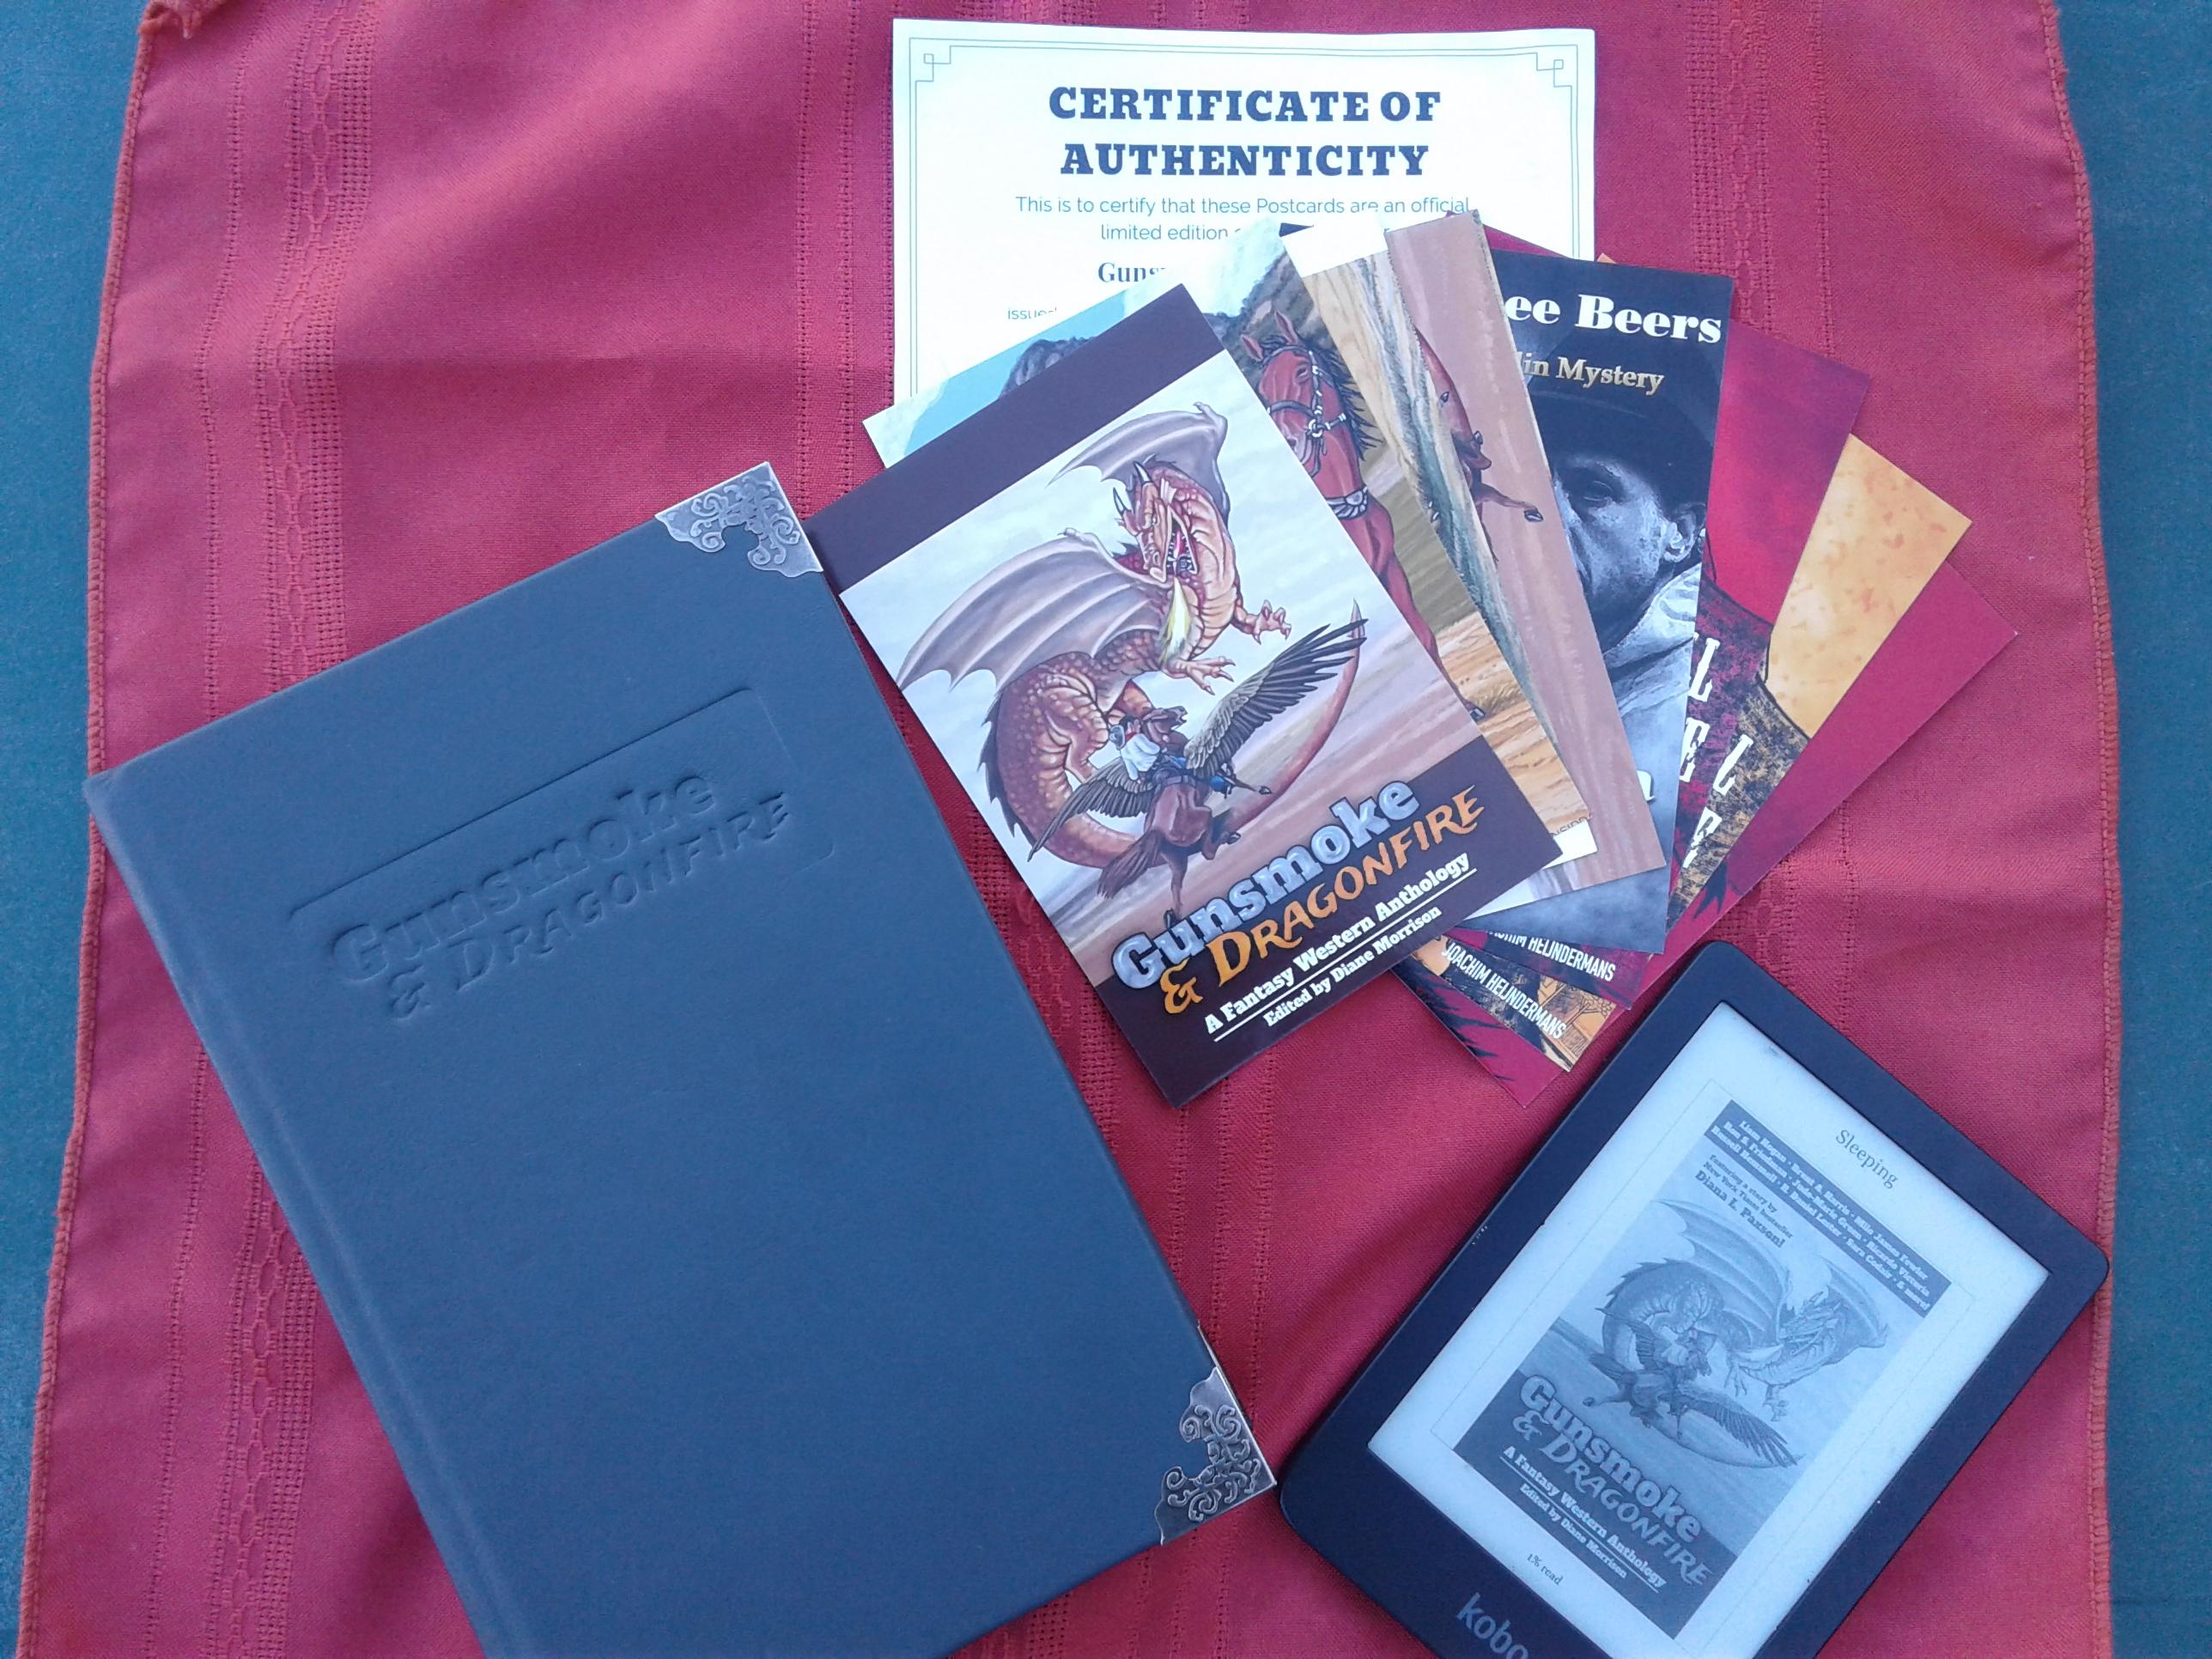 Gunsmoke & Dragonfire September Giveaway!